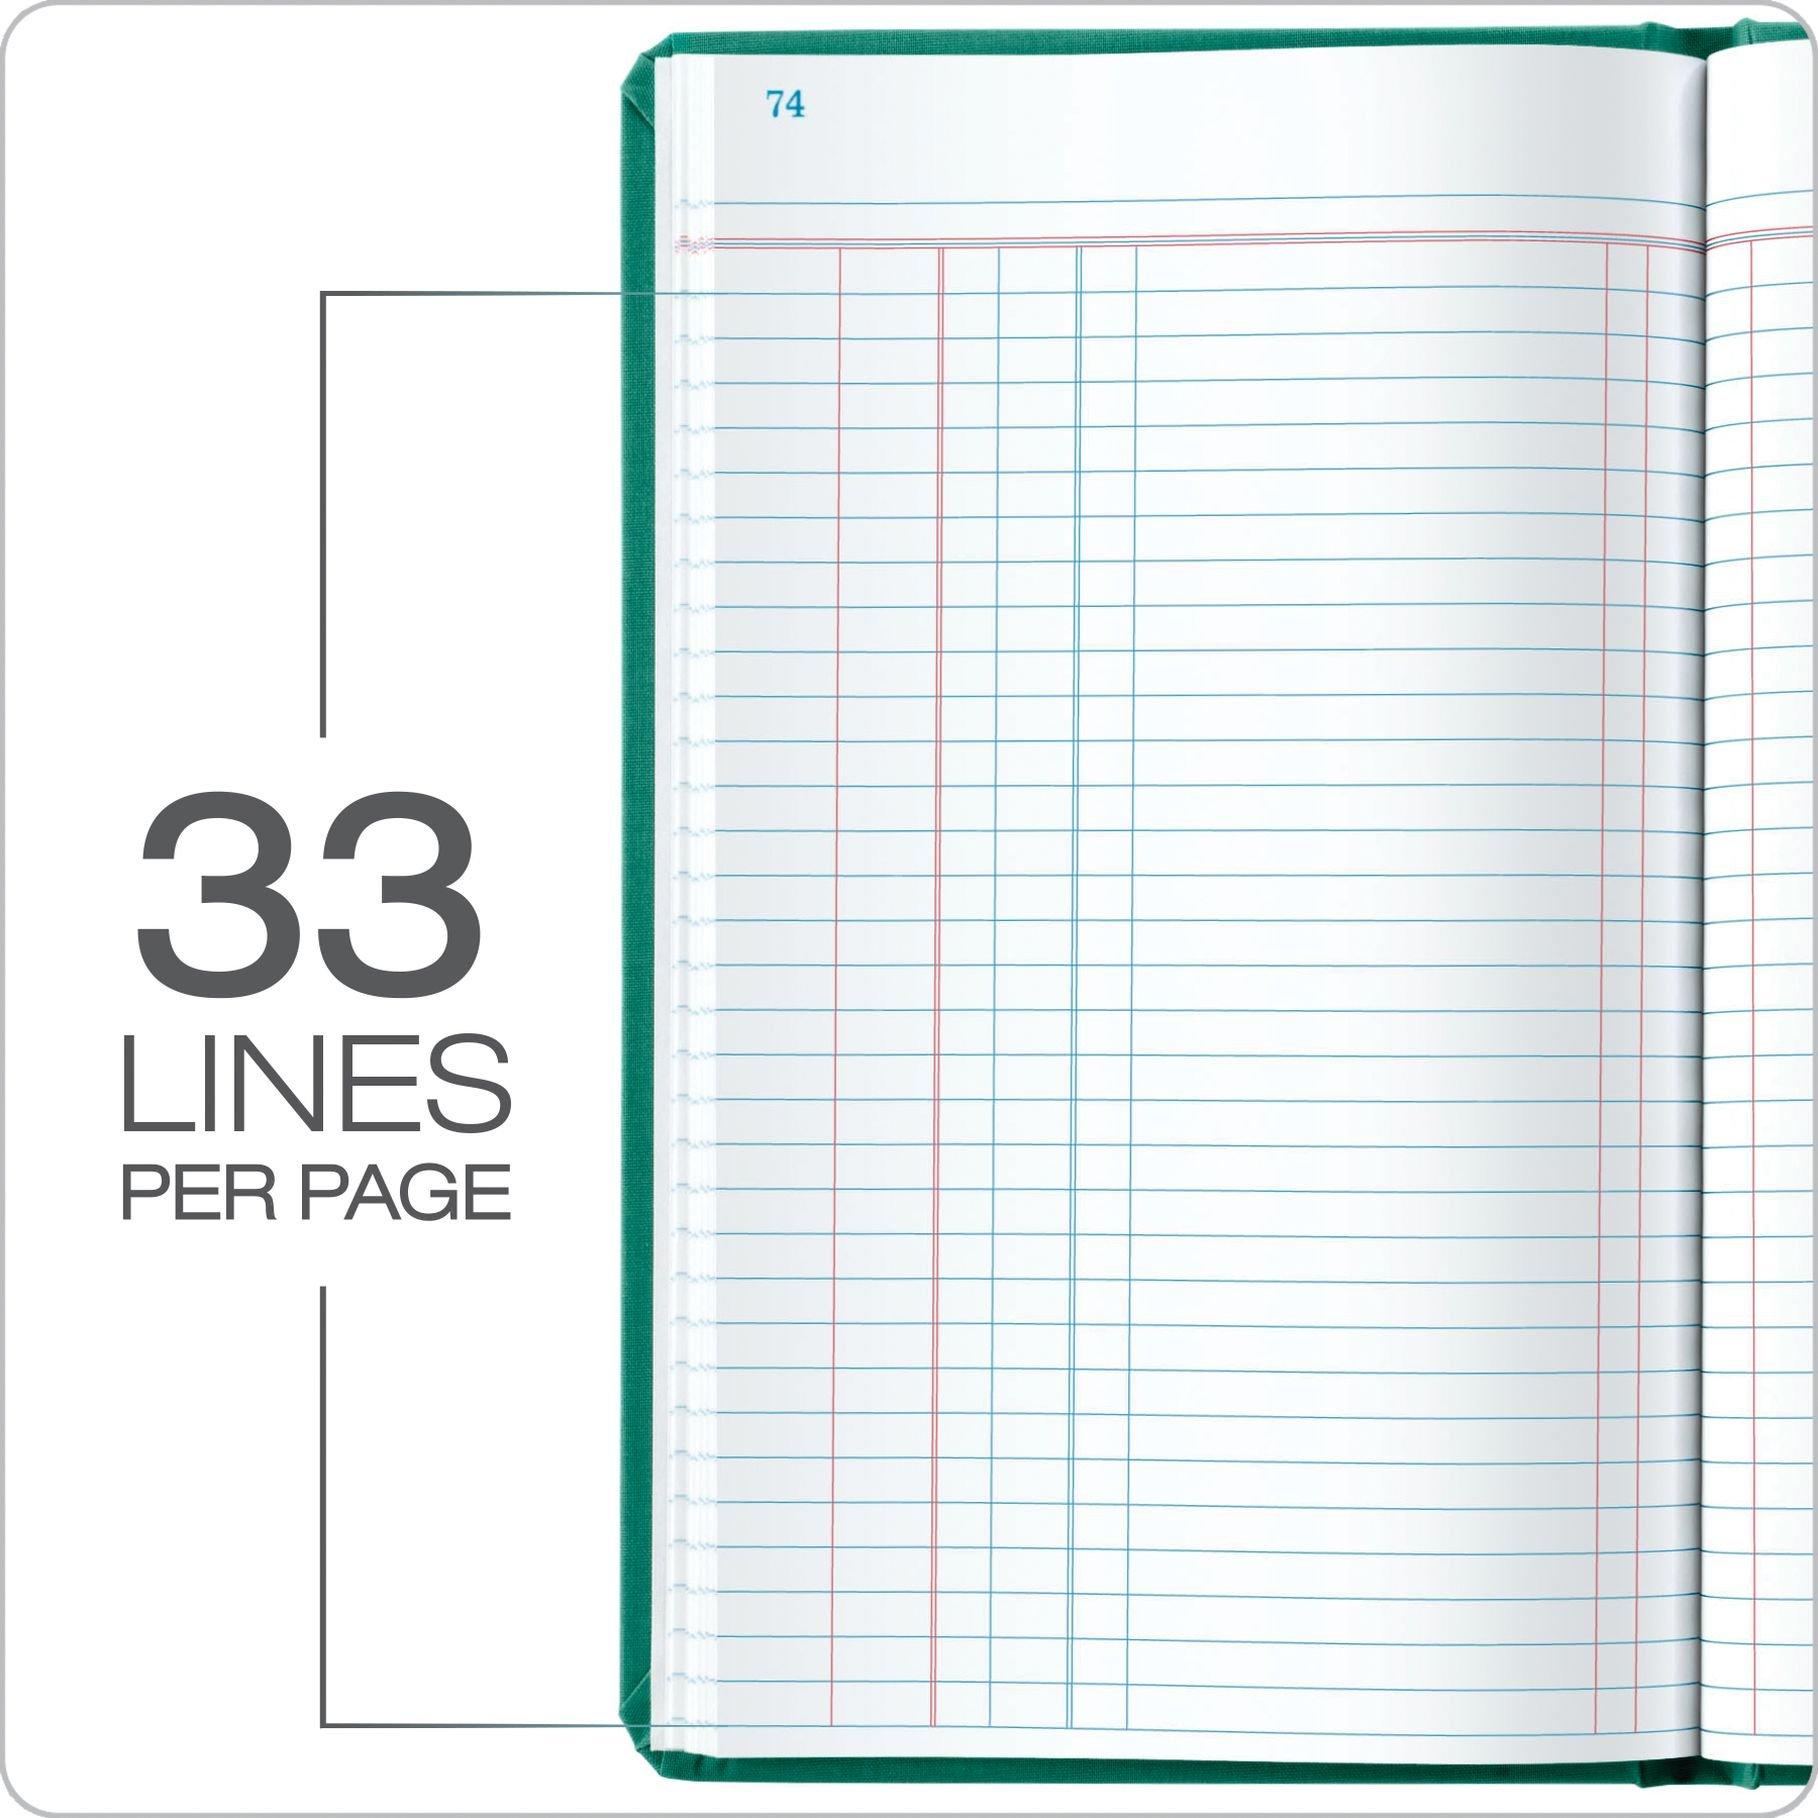 Boorum & Pease 66 Series Account Book, Journal Ruled, Green, 500 Pages, 12-1/8'' x 7-5/8'' (66-500-J) by Boorum & Pease (Image #4)